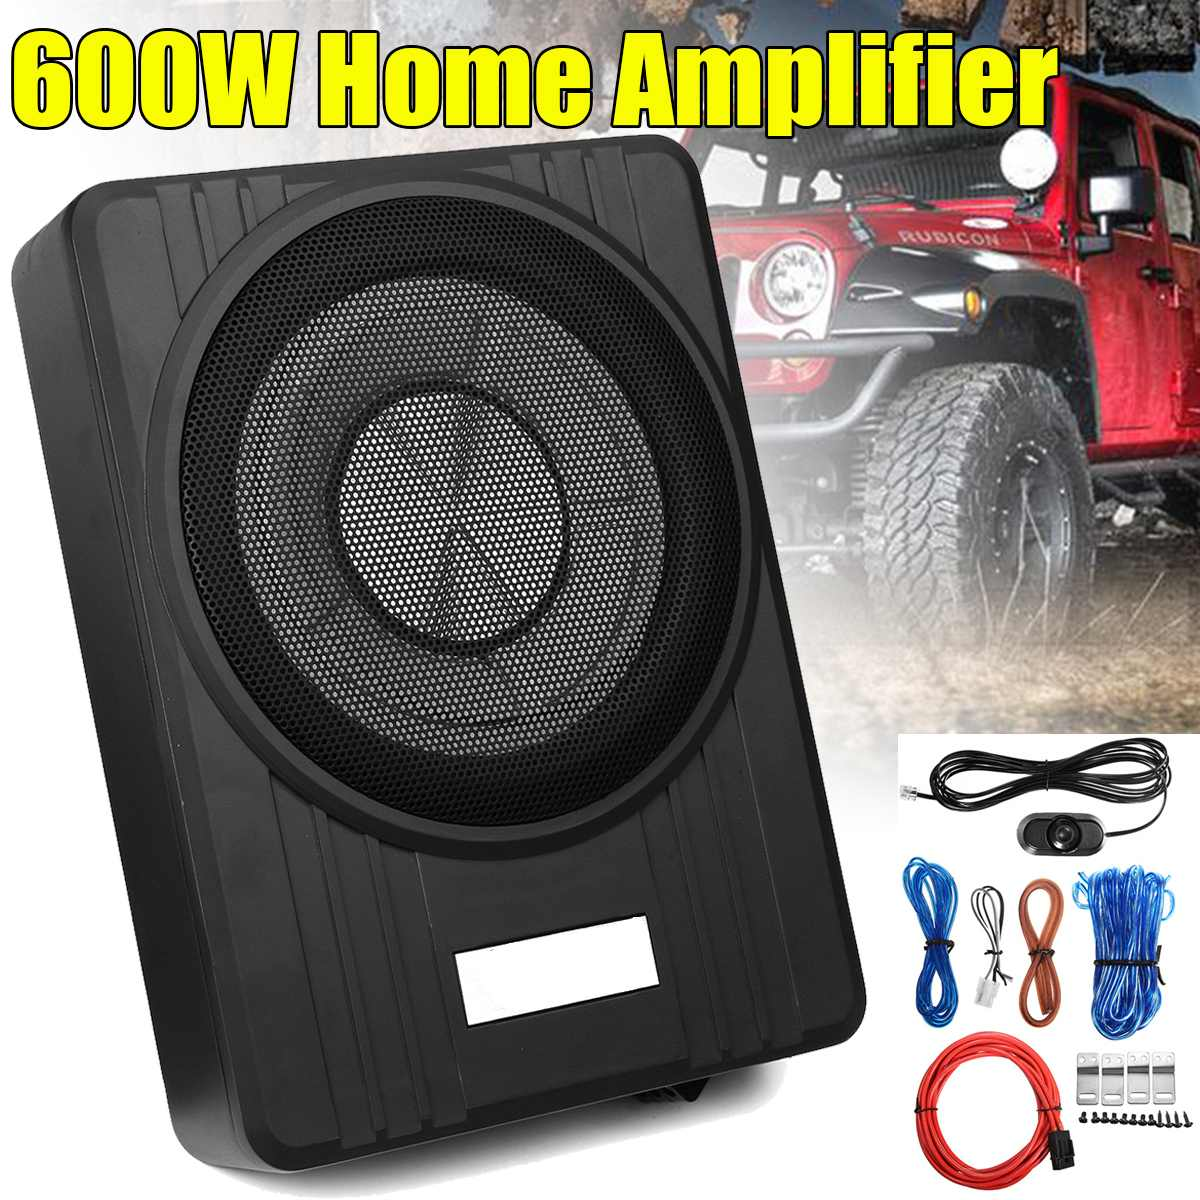 Under Seat Ultra Thin Car Subwoofer Slim Active Amplifier Speaker 600W 10 Inch